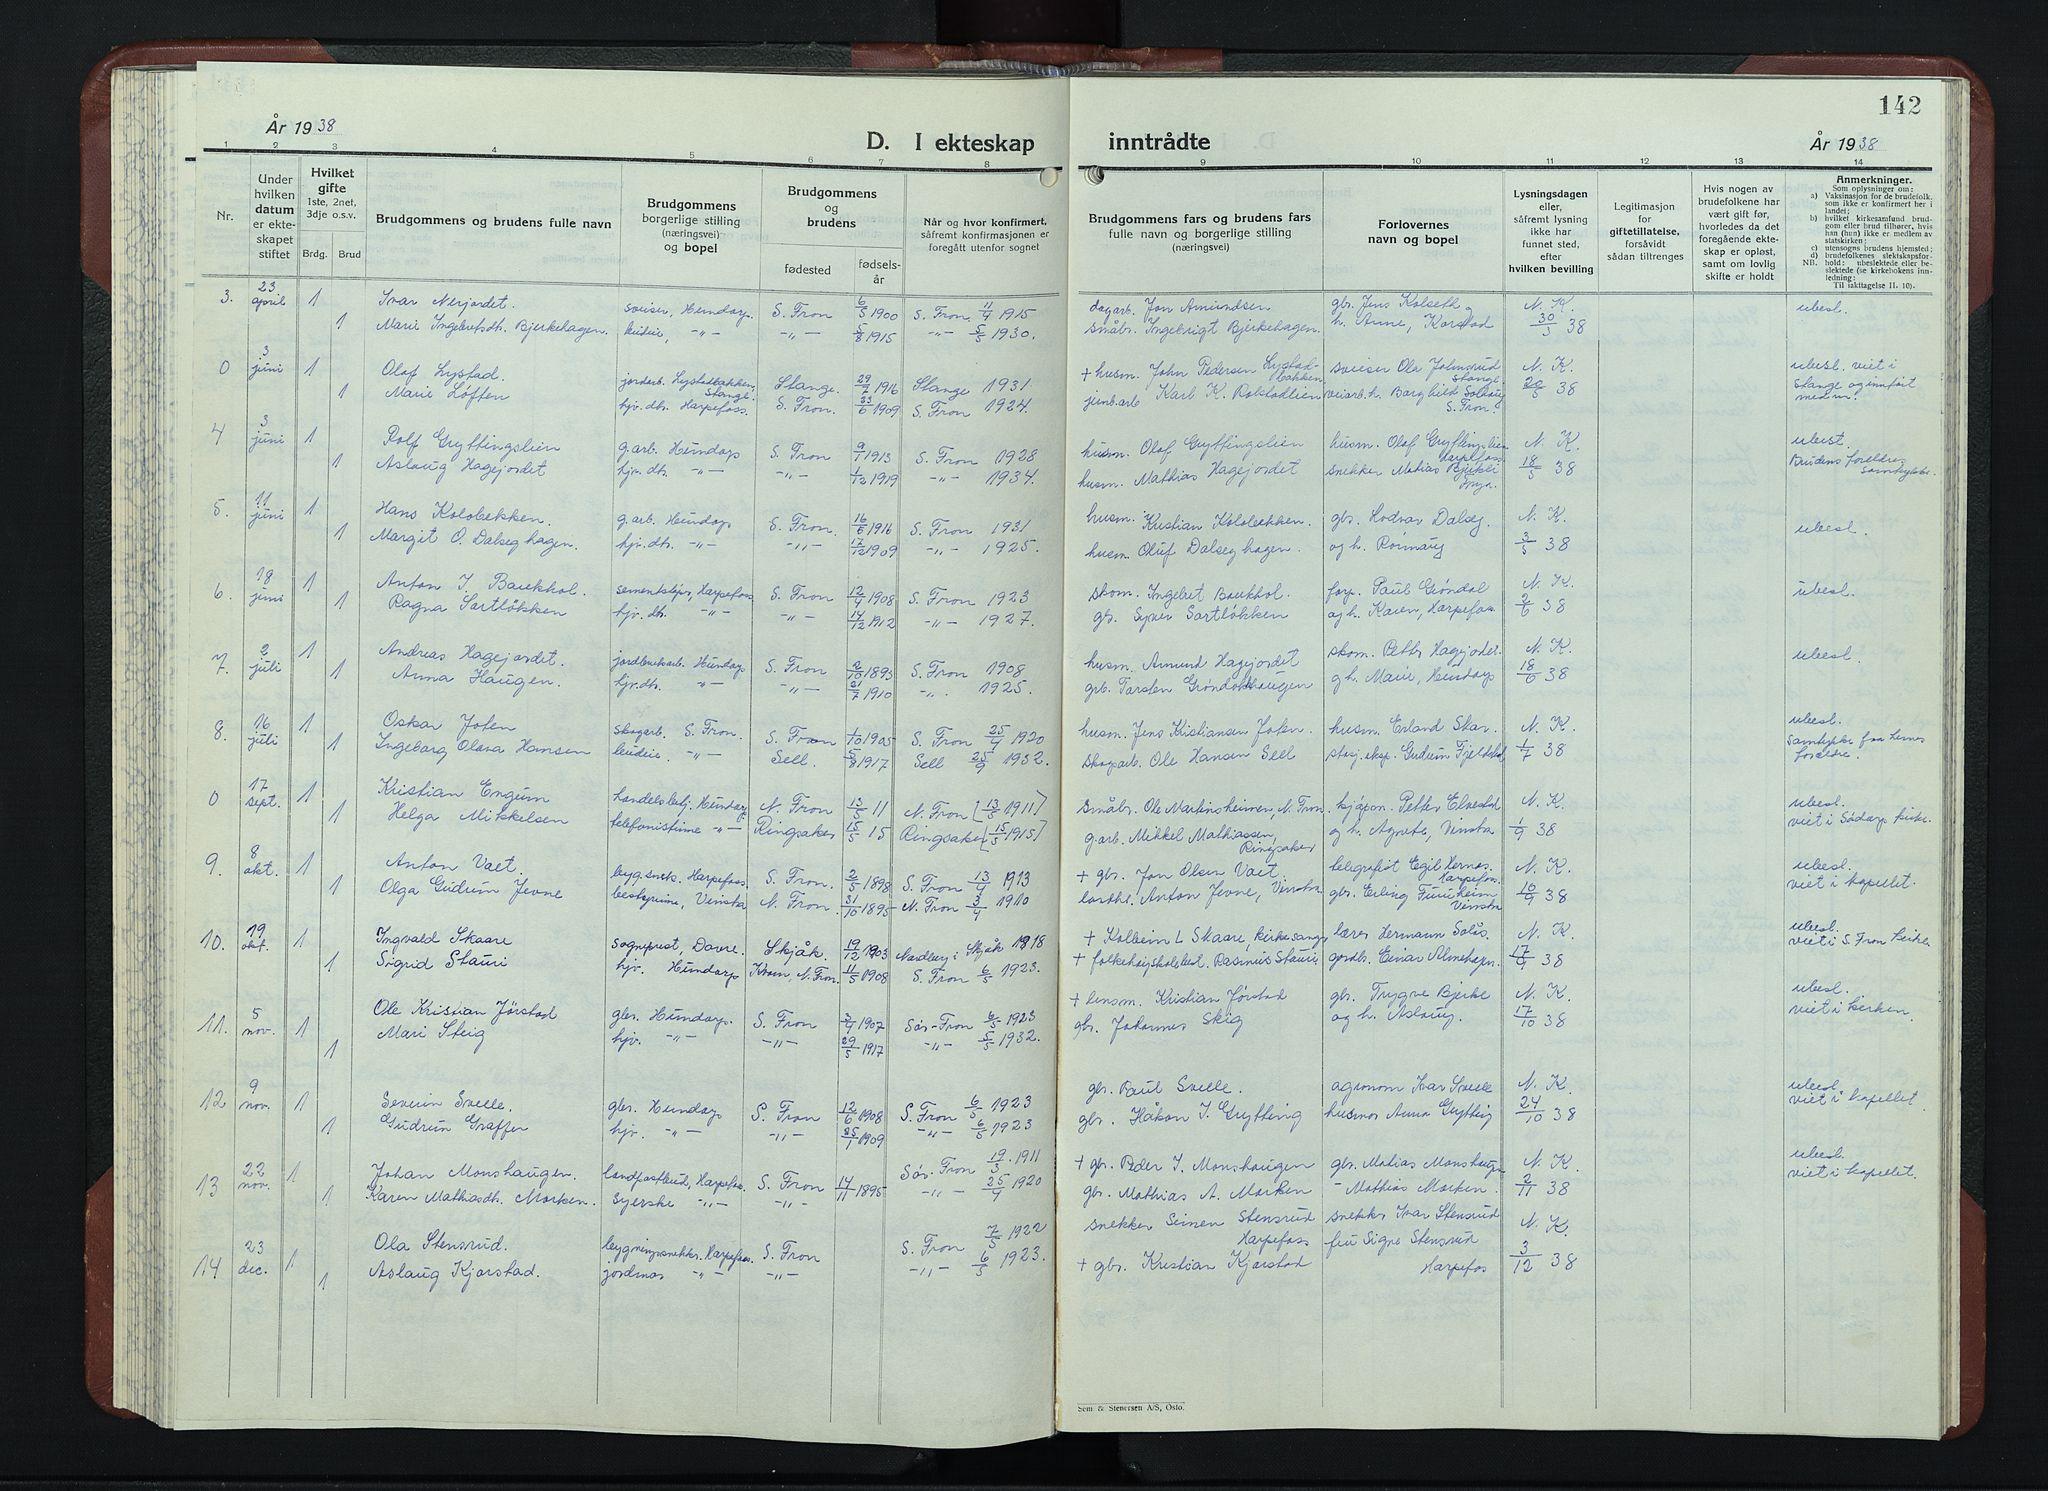 SAH, Sør-Fron prestekontor, H/Ha/Hab/L0006: Klokkerbok nr. 6, 1933-1948, s. 142